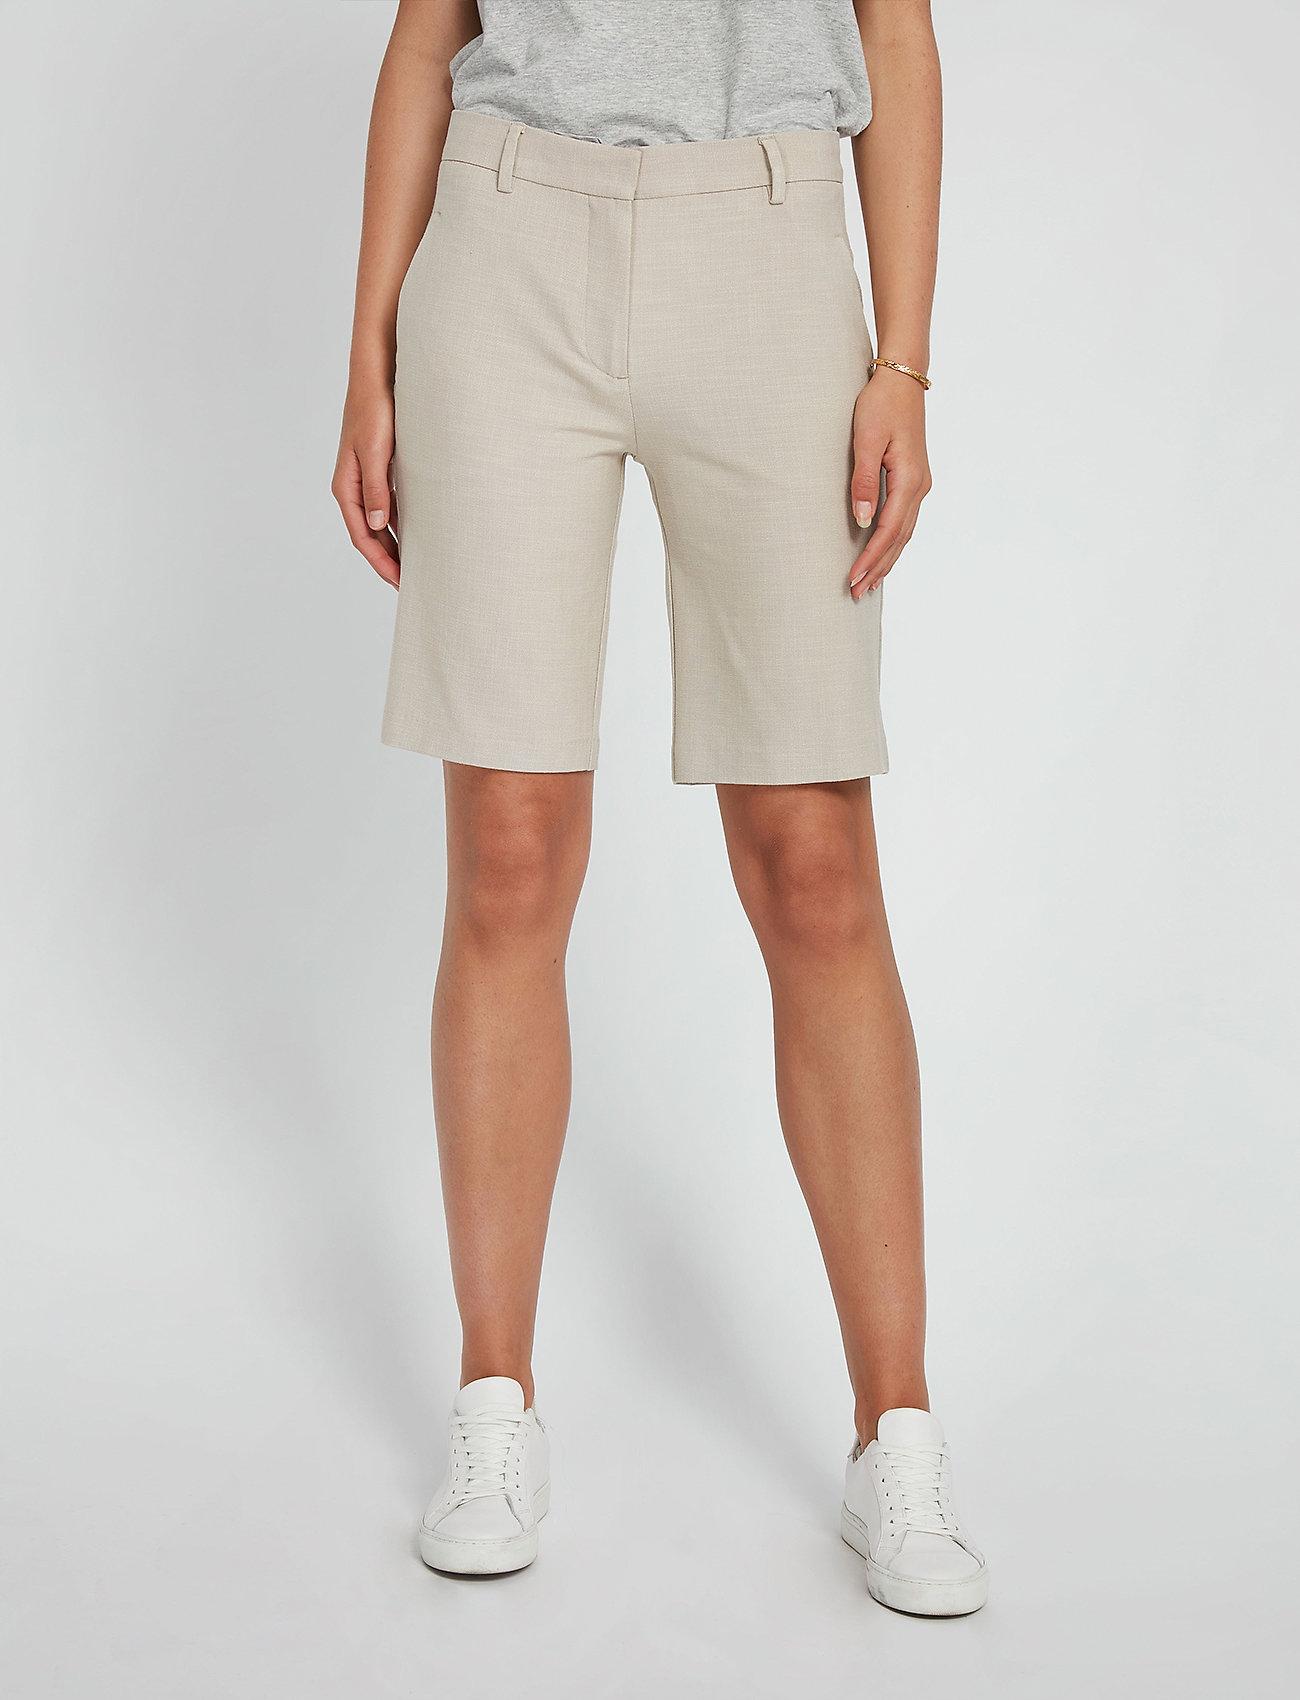 FIVEUNITS - Kylie Shorts 396 - chino shorts - plaza melange - 0